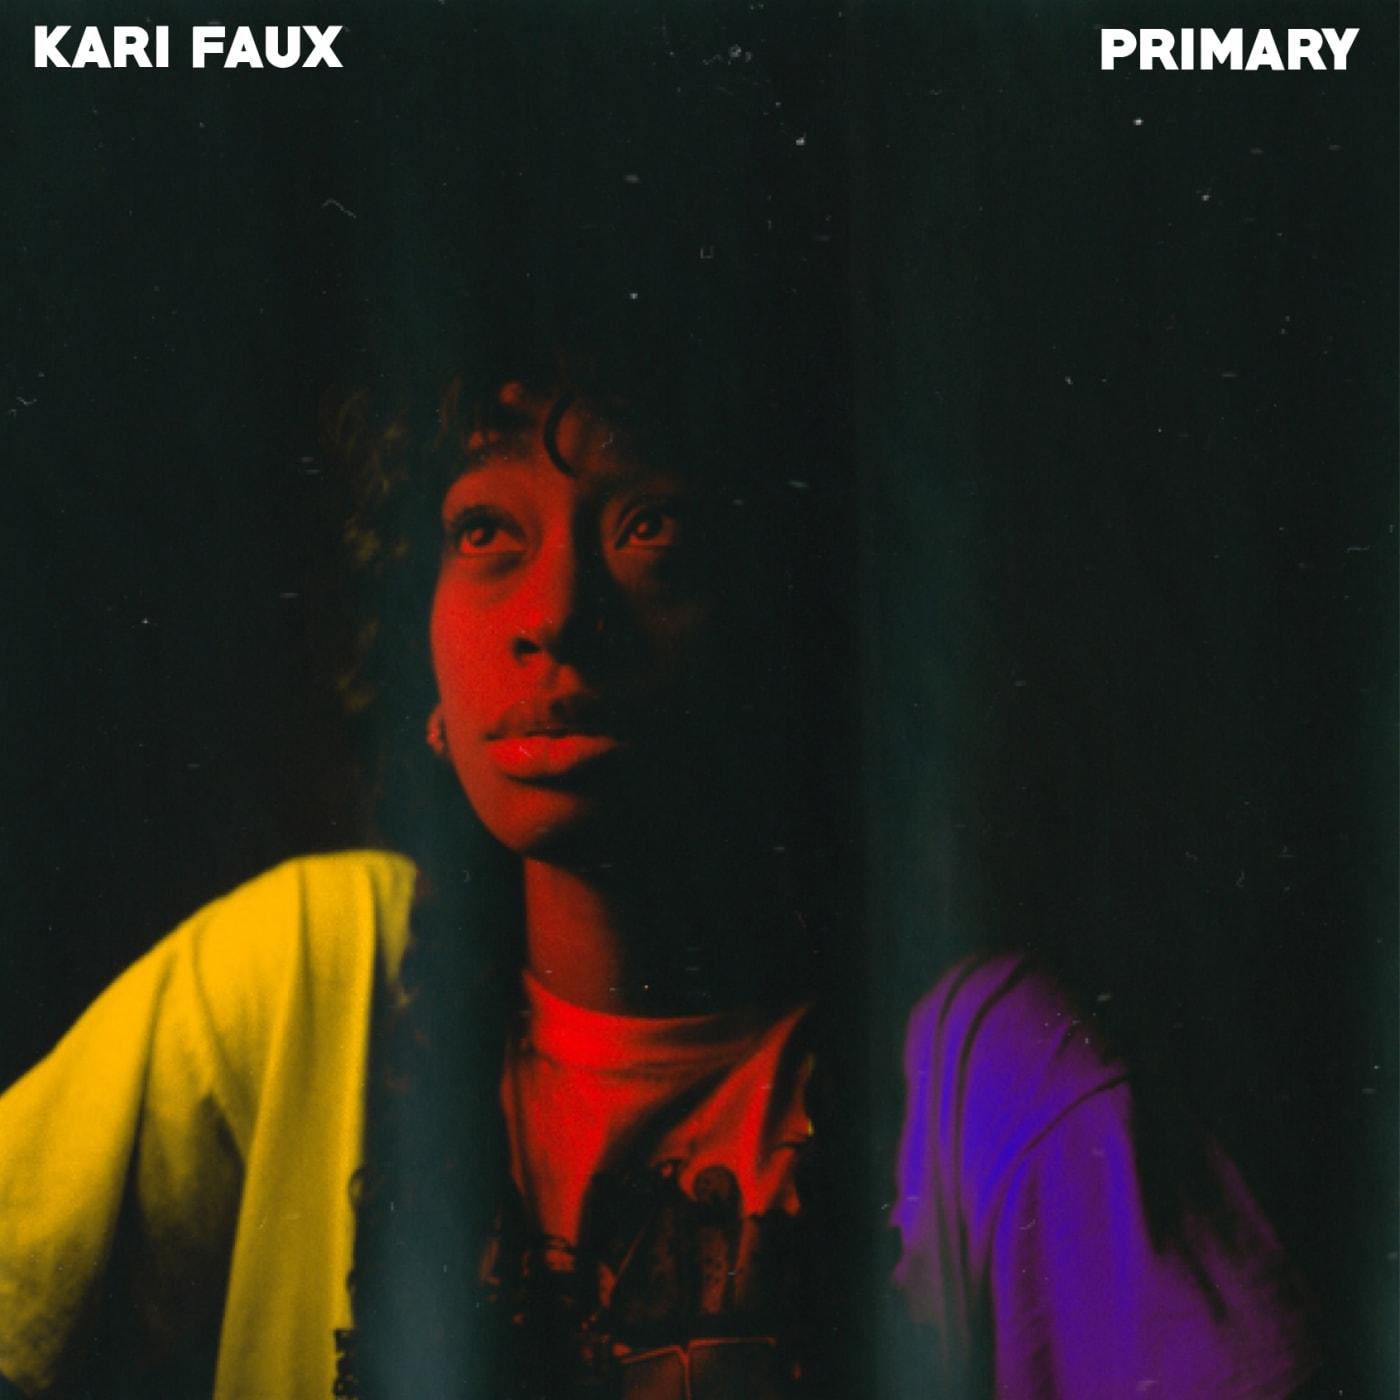 kari faux primary cover